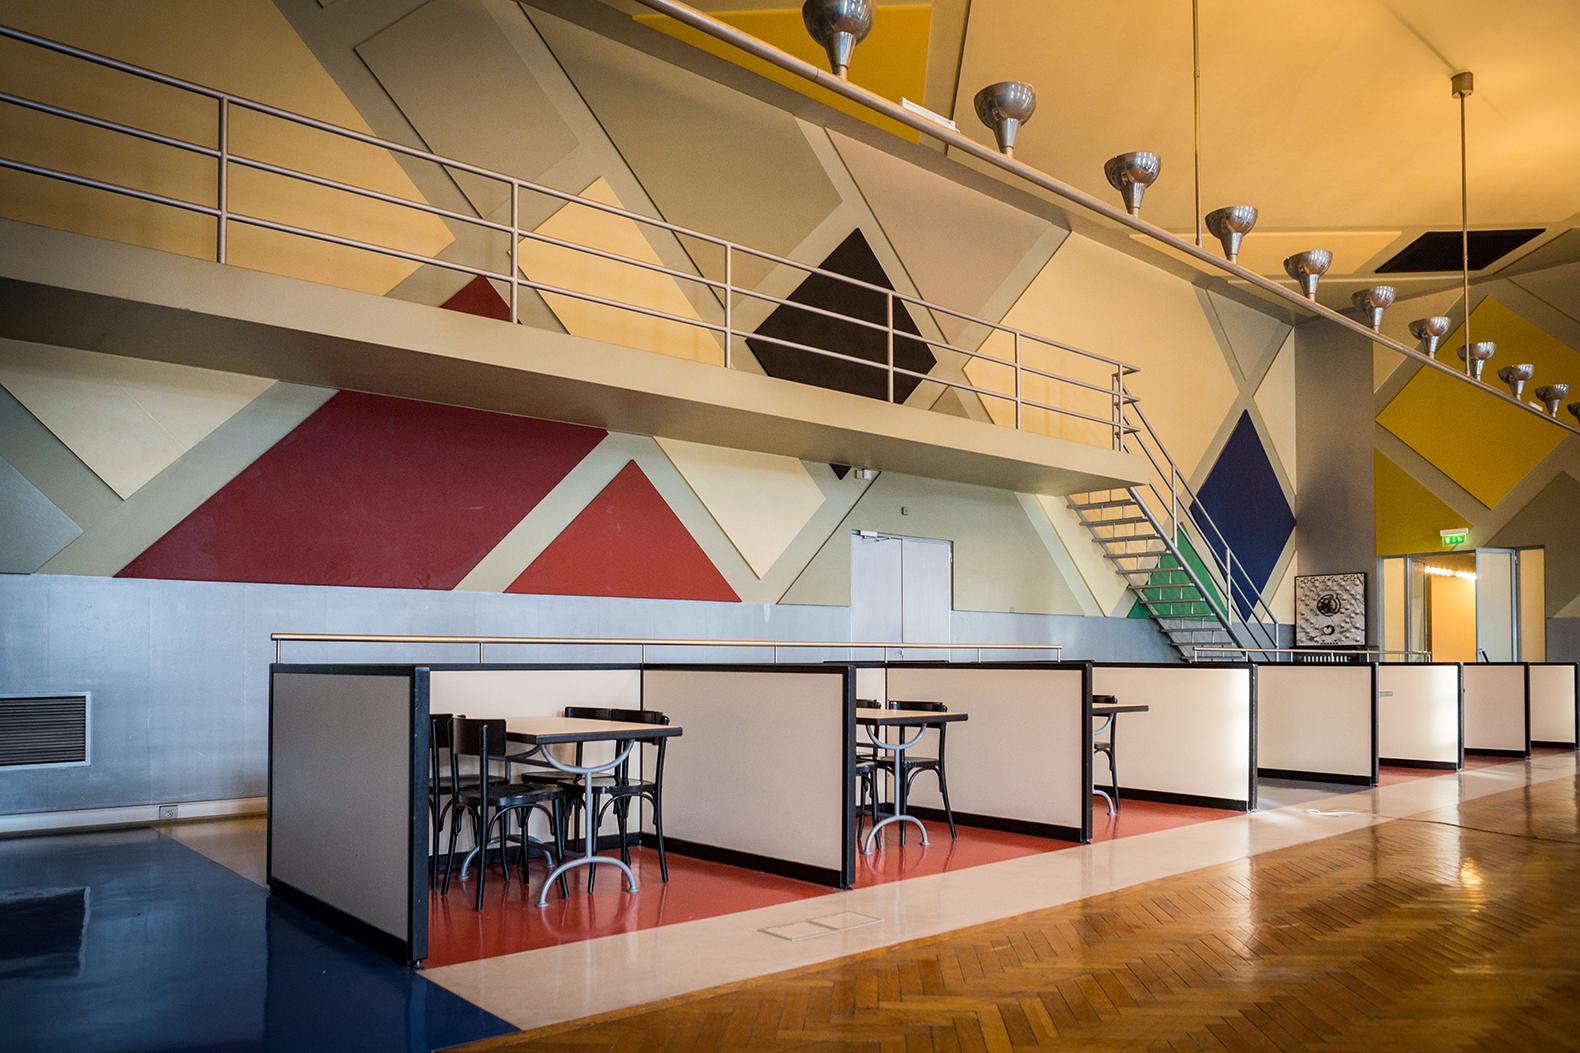 caf aubette o como habitar una pintura metalocus. Black Bedroom Furniture Sets. Home Design Ideas